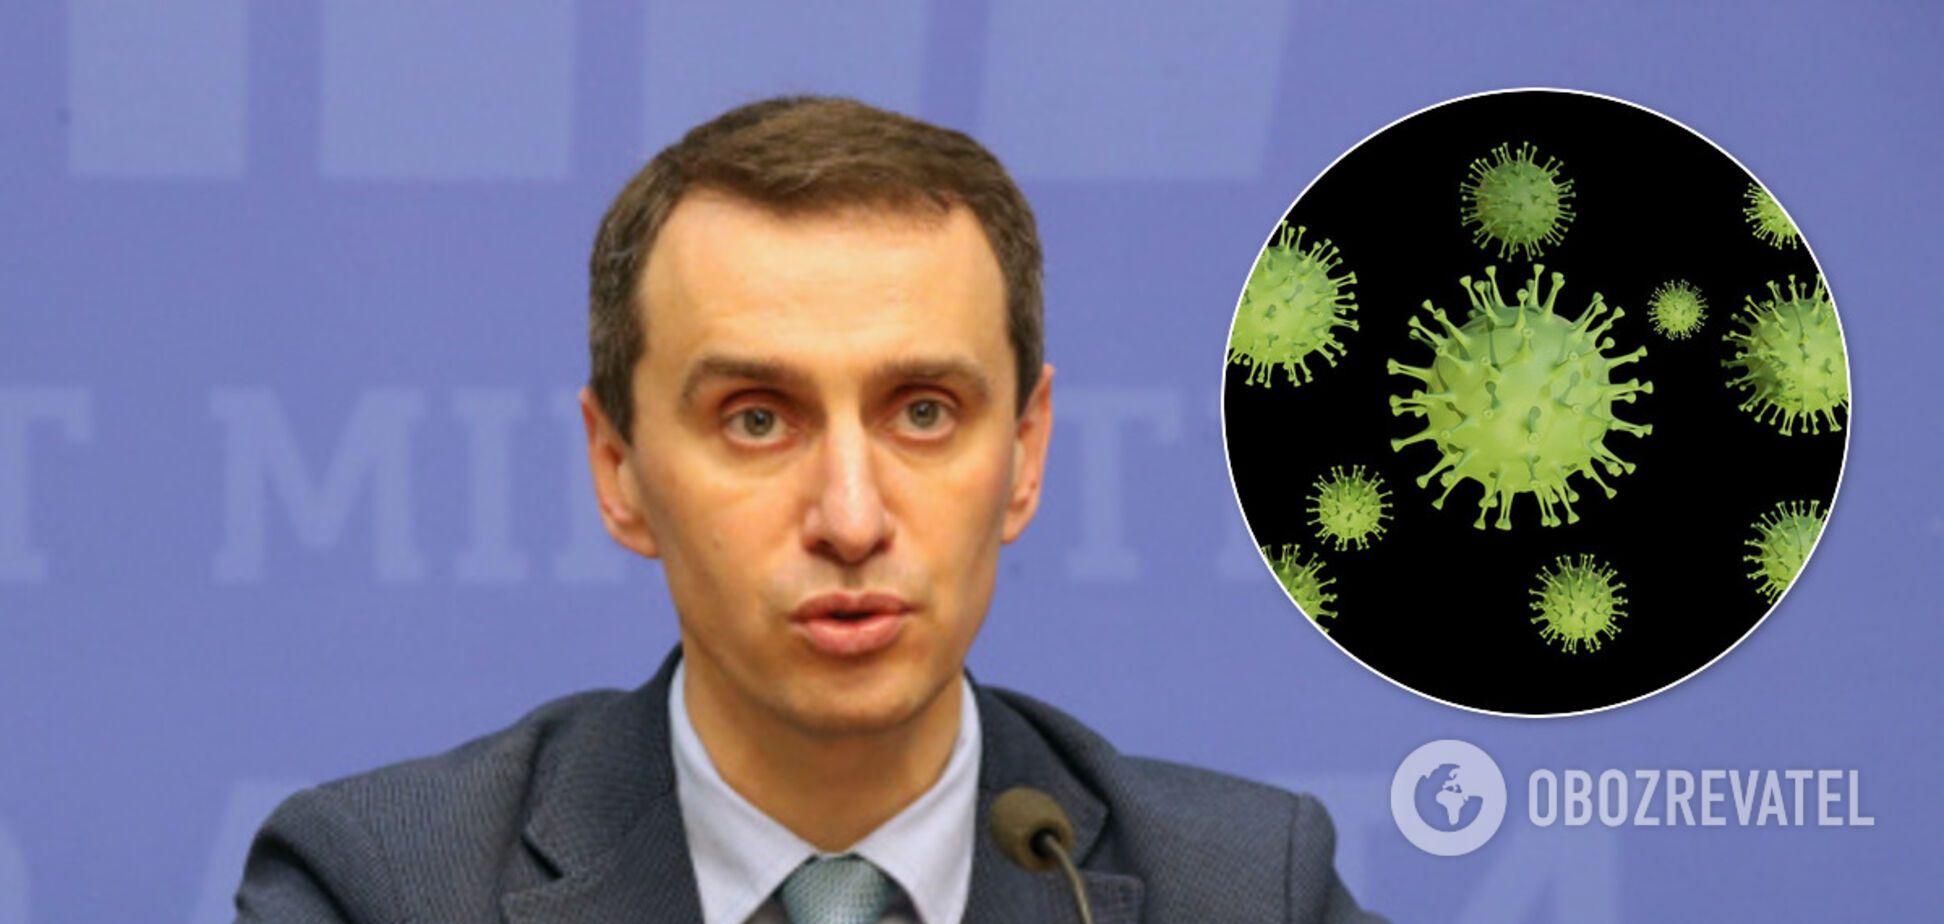 Виктор Ляшко озвучил условие победы над COVID-19